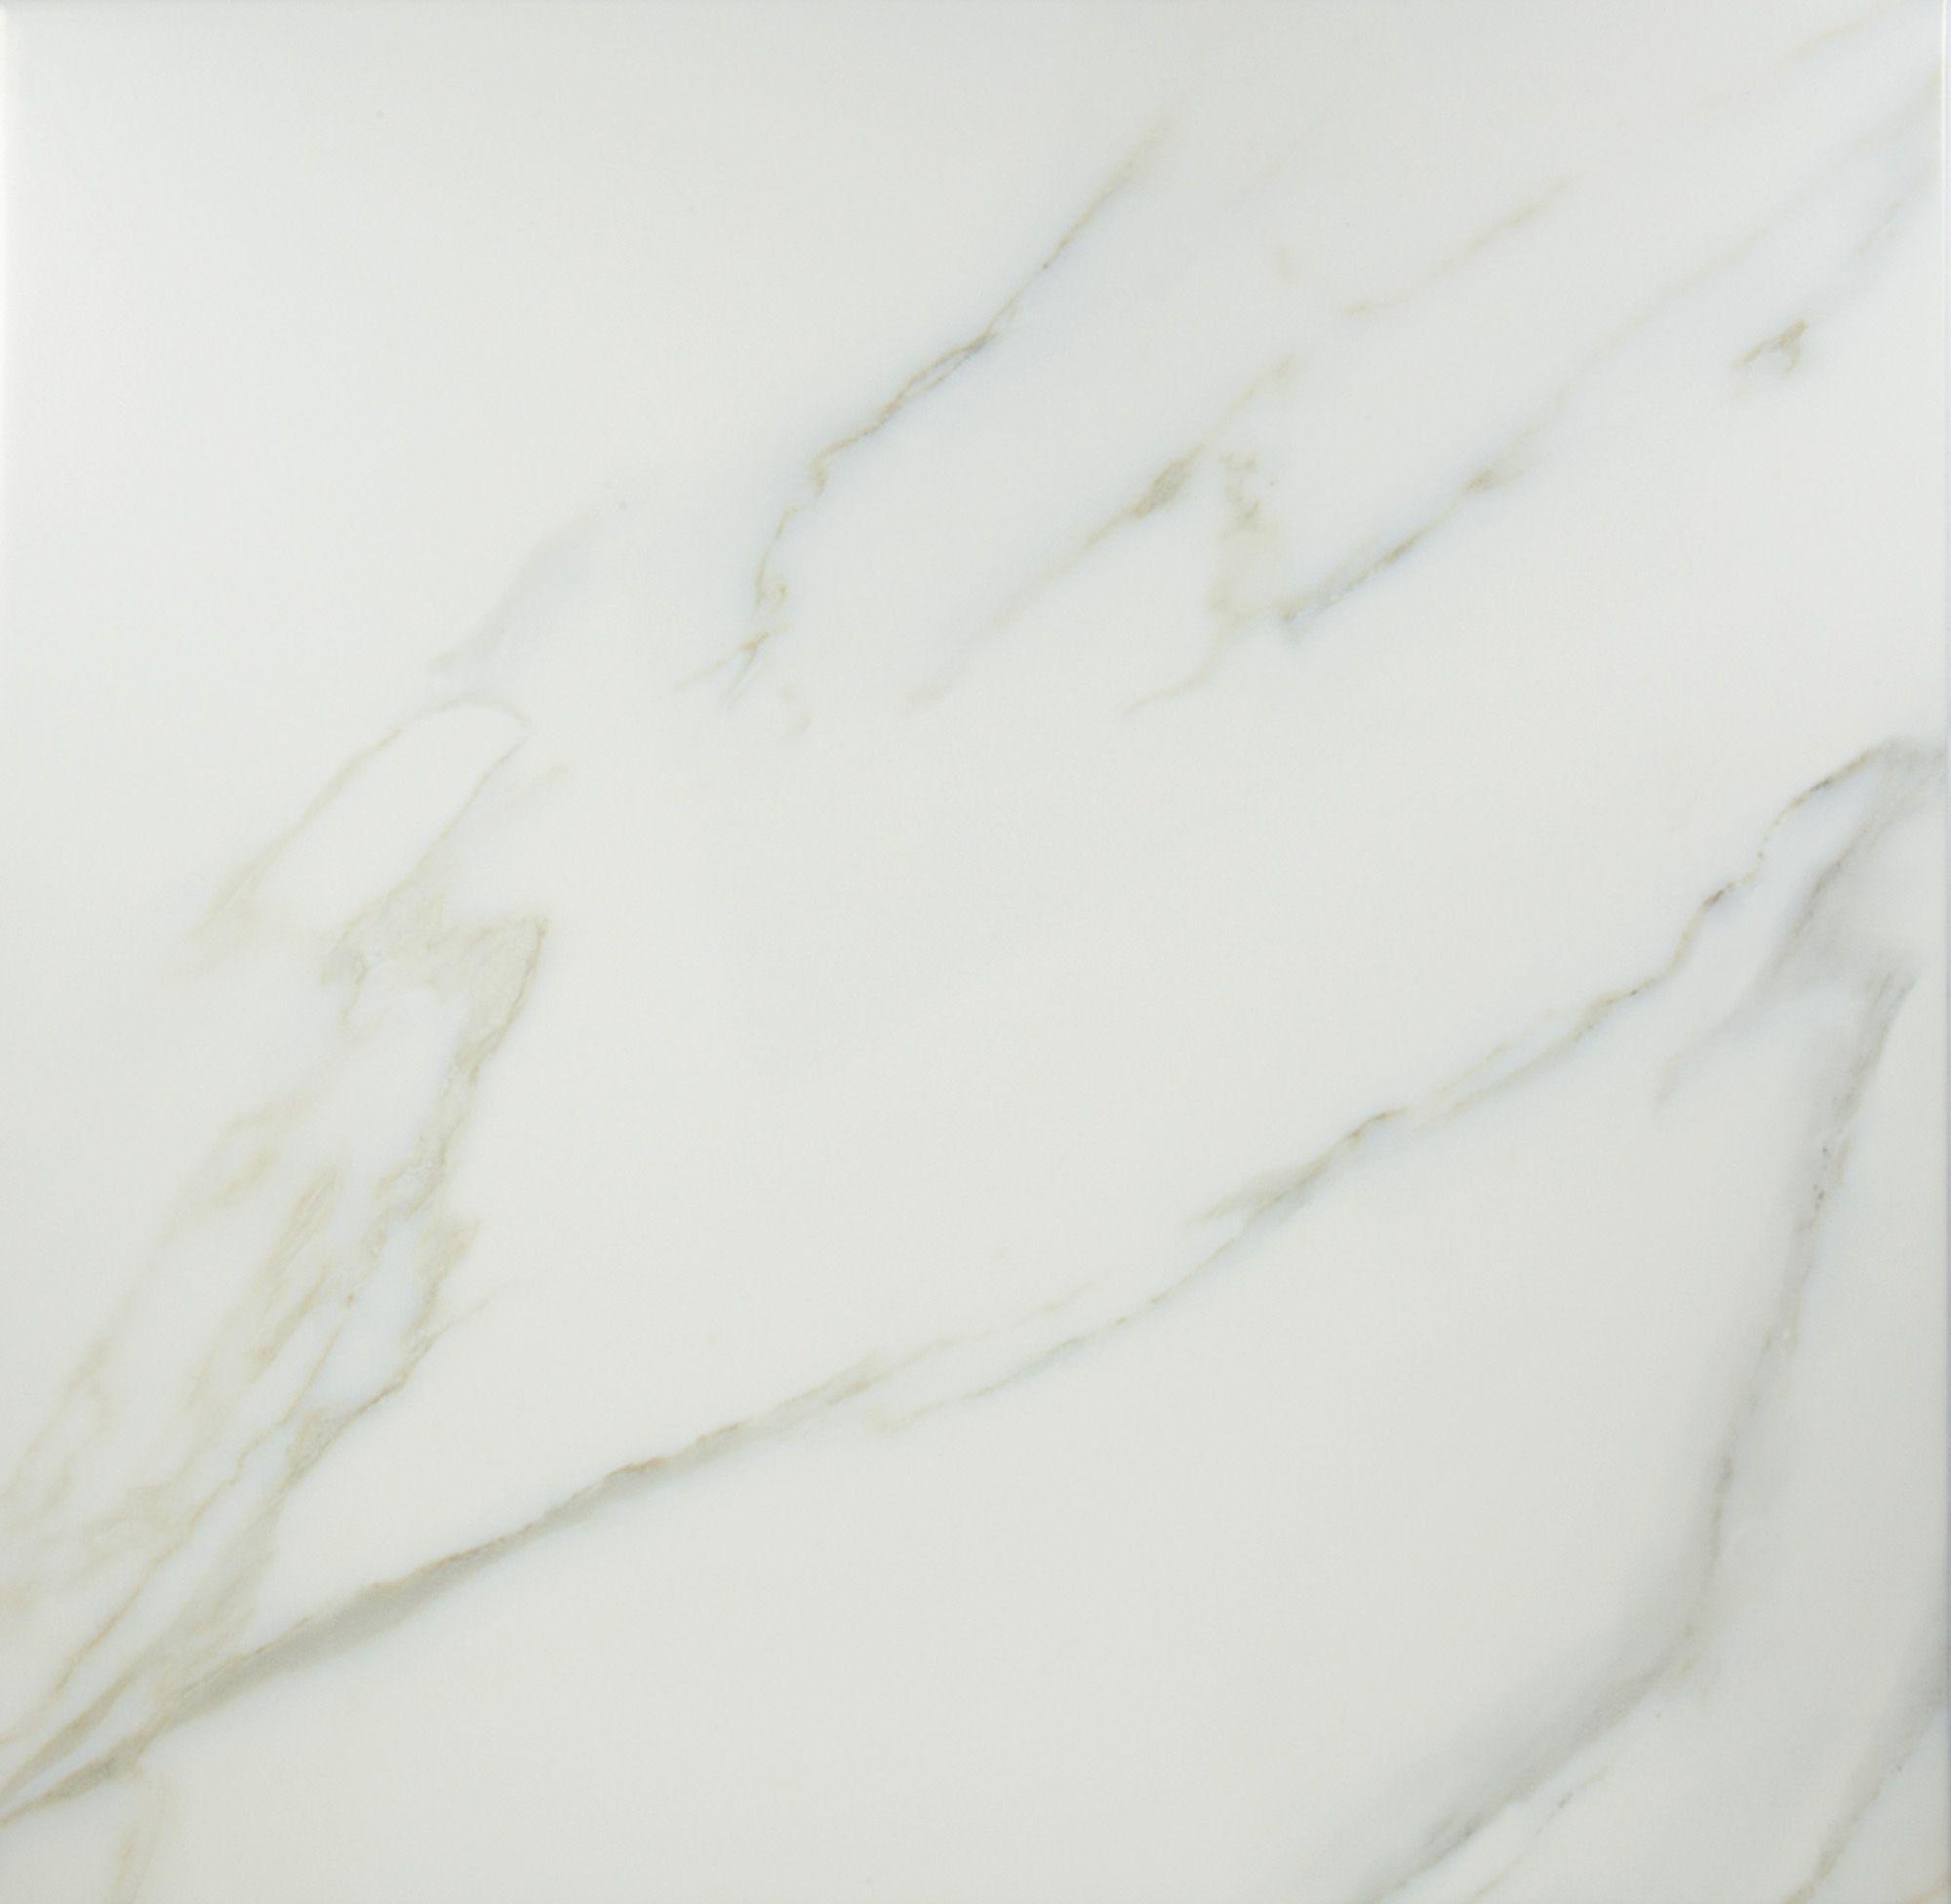 Aquila white stone effect carrara porcelain floor tile pack of 5 aquila white stone effect carrara porcelain floor tile pack of 5 l450mm w450mm dailygadgetfo Gallery